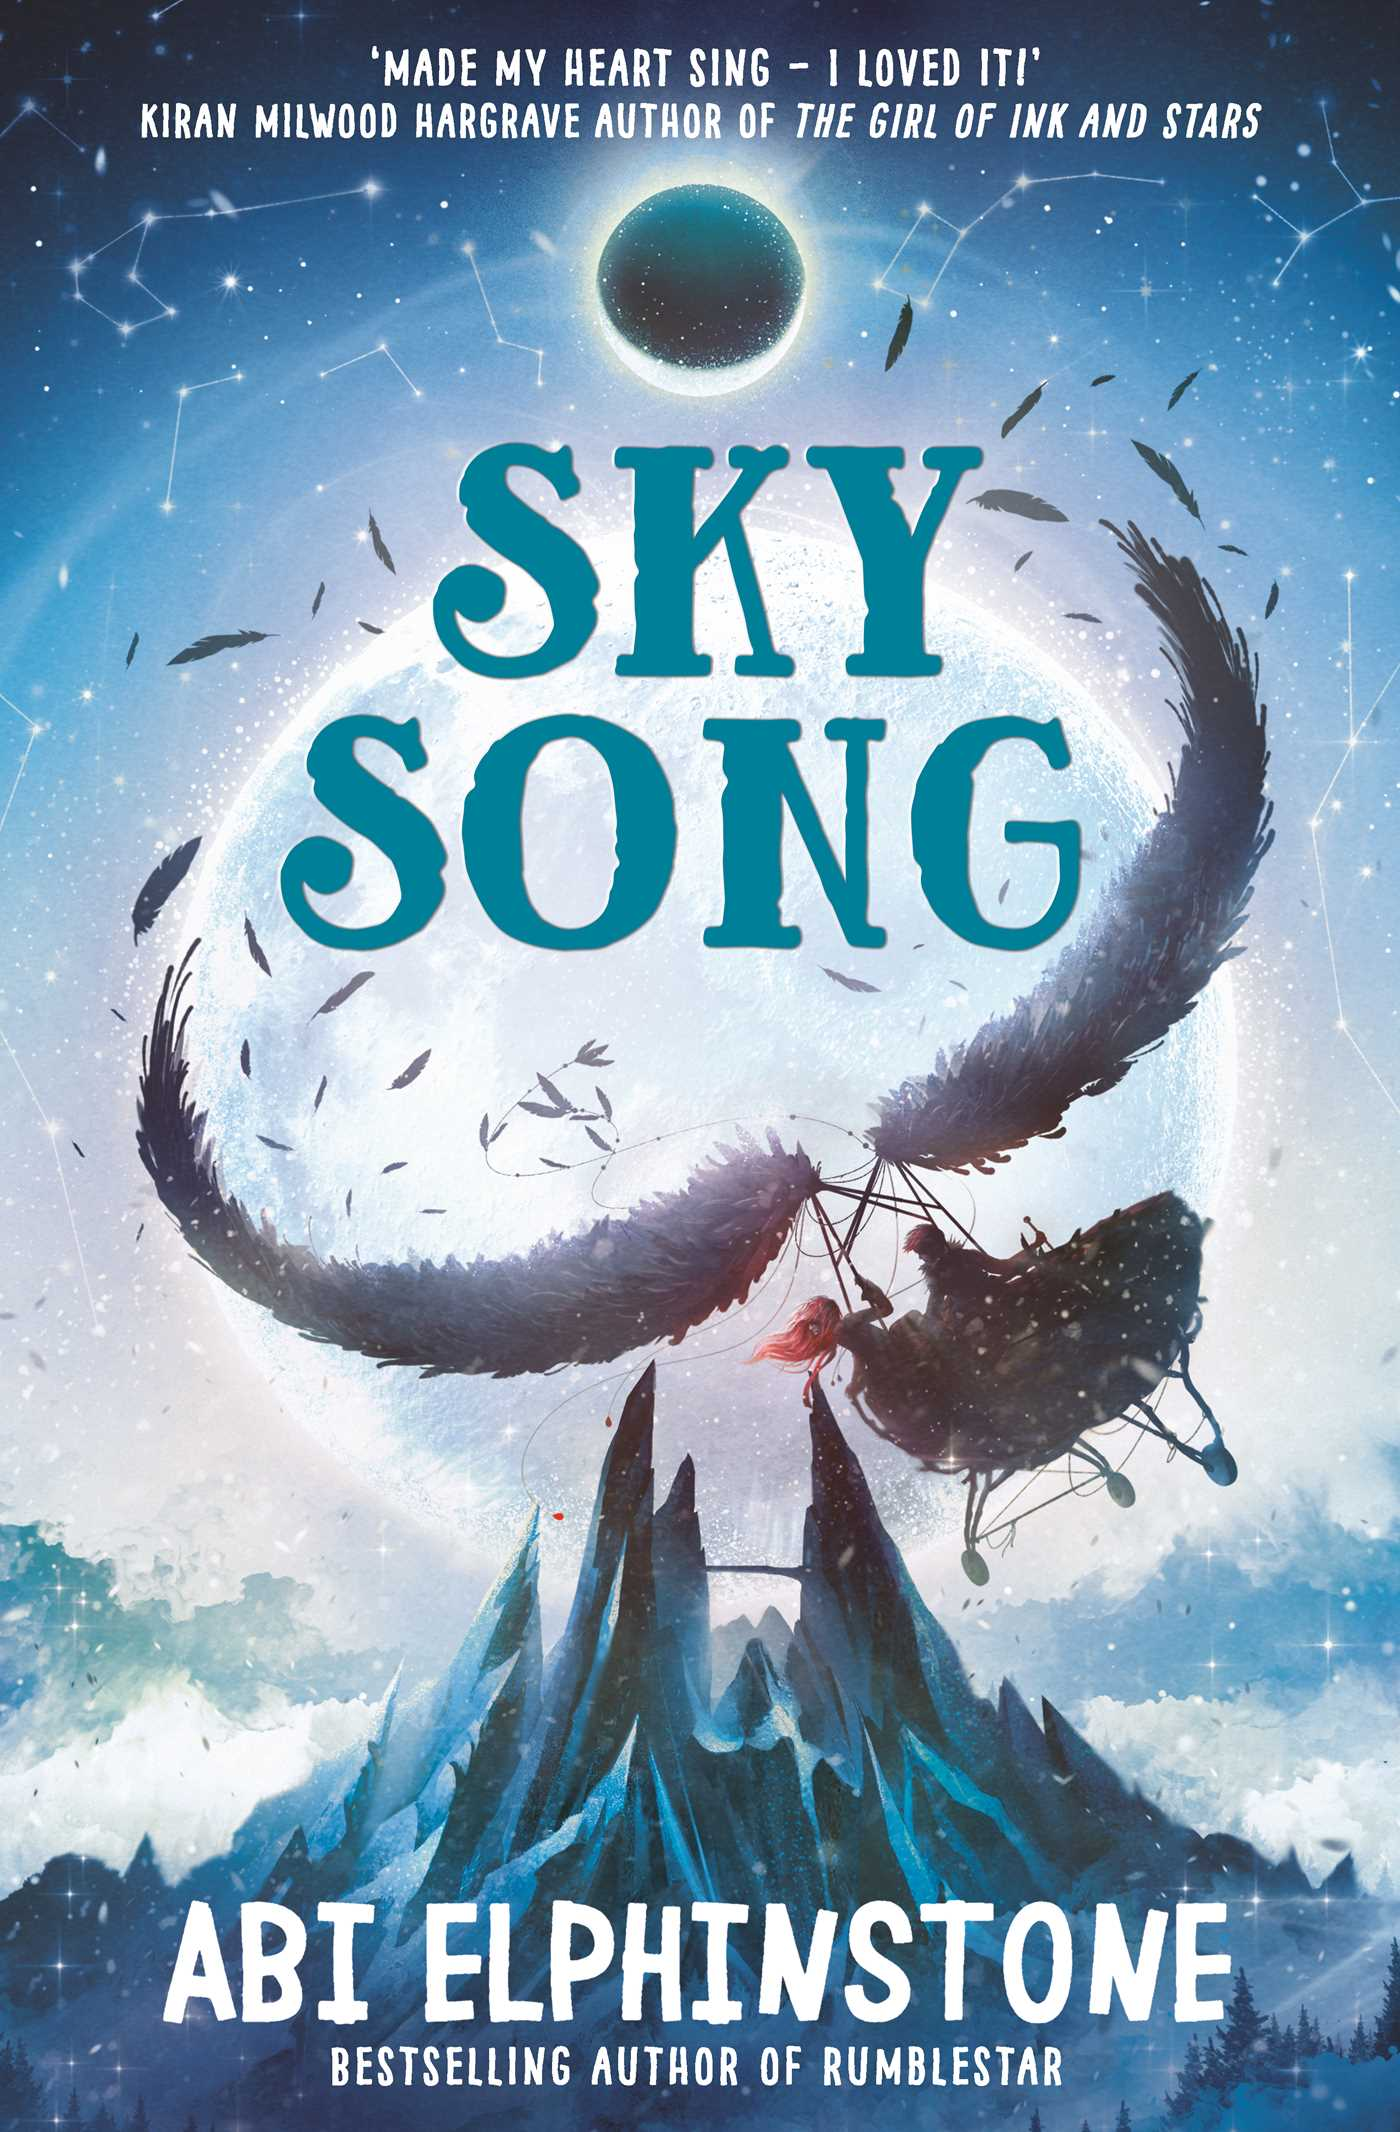 Sky song 9781471146077 hr